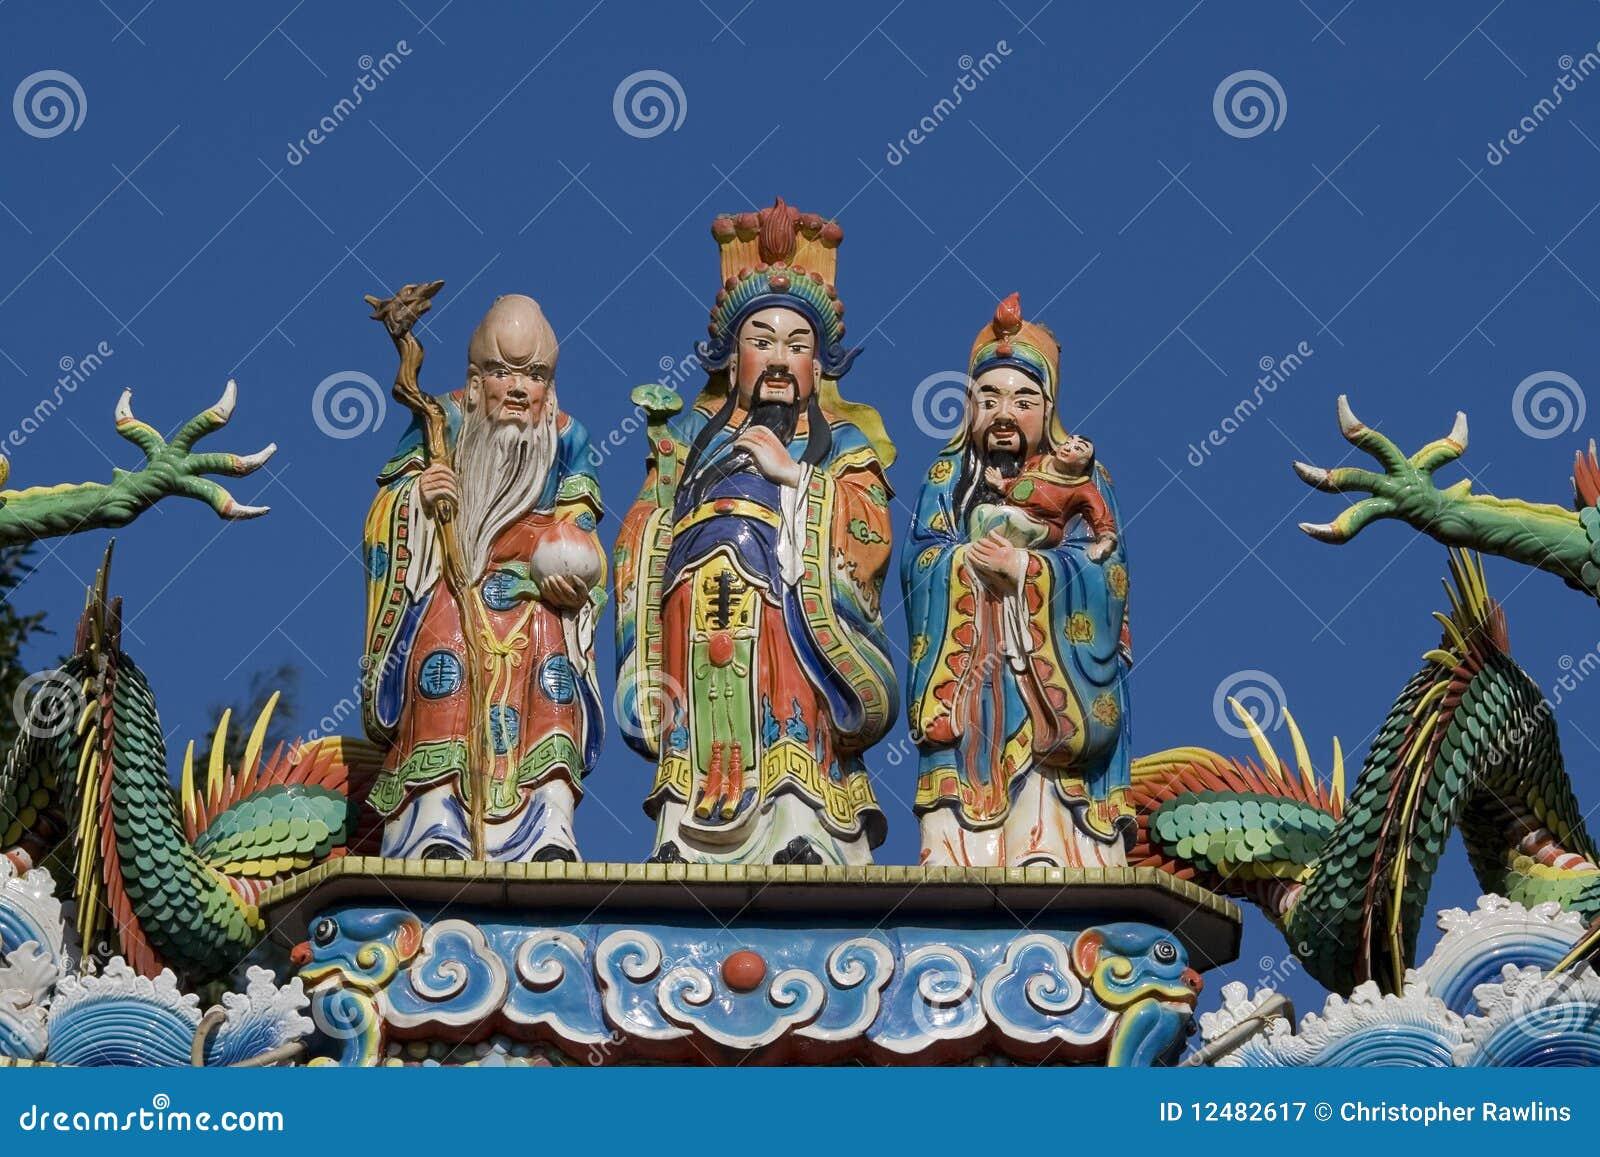 Three Wise Men on Temple